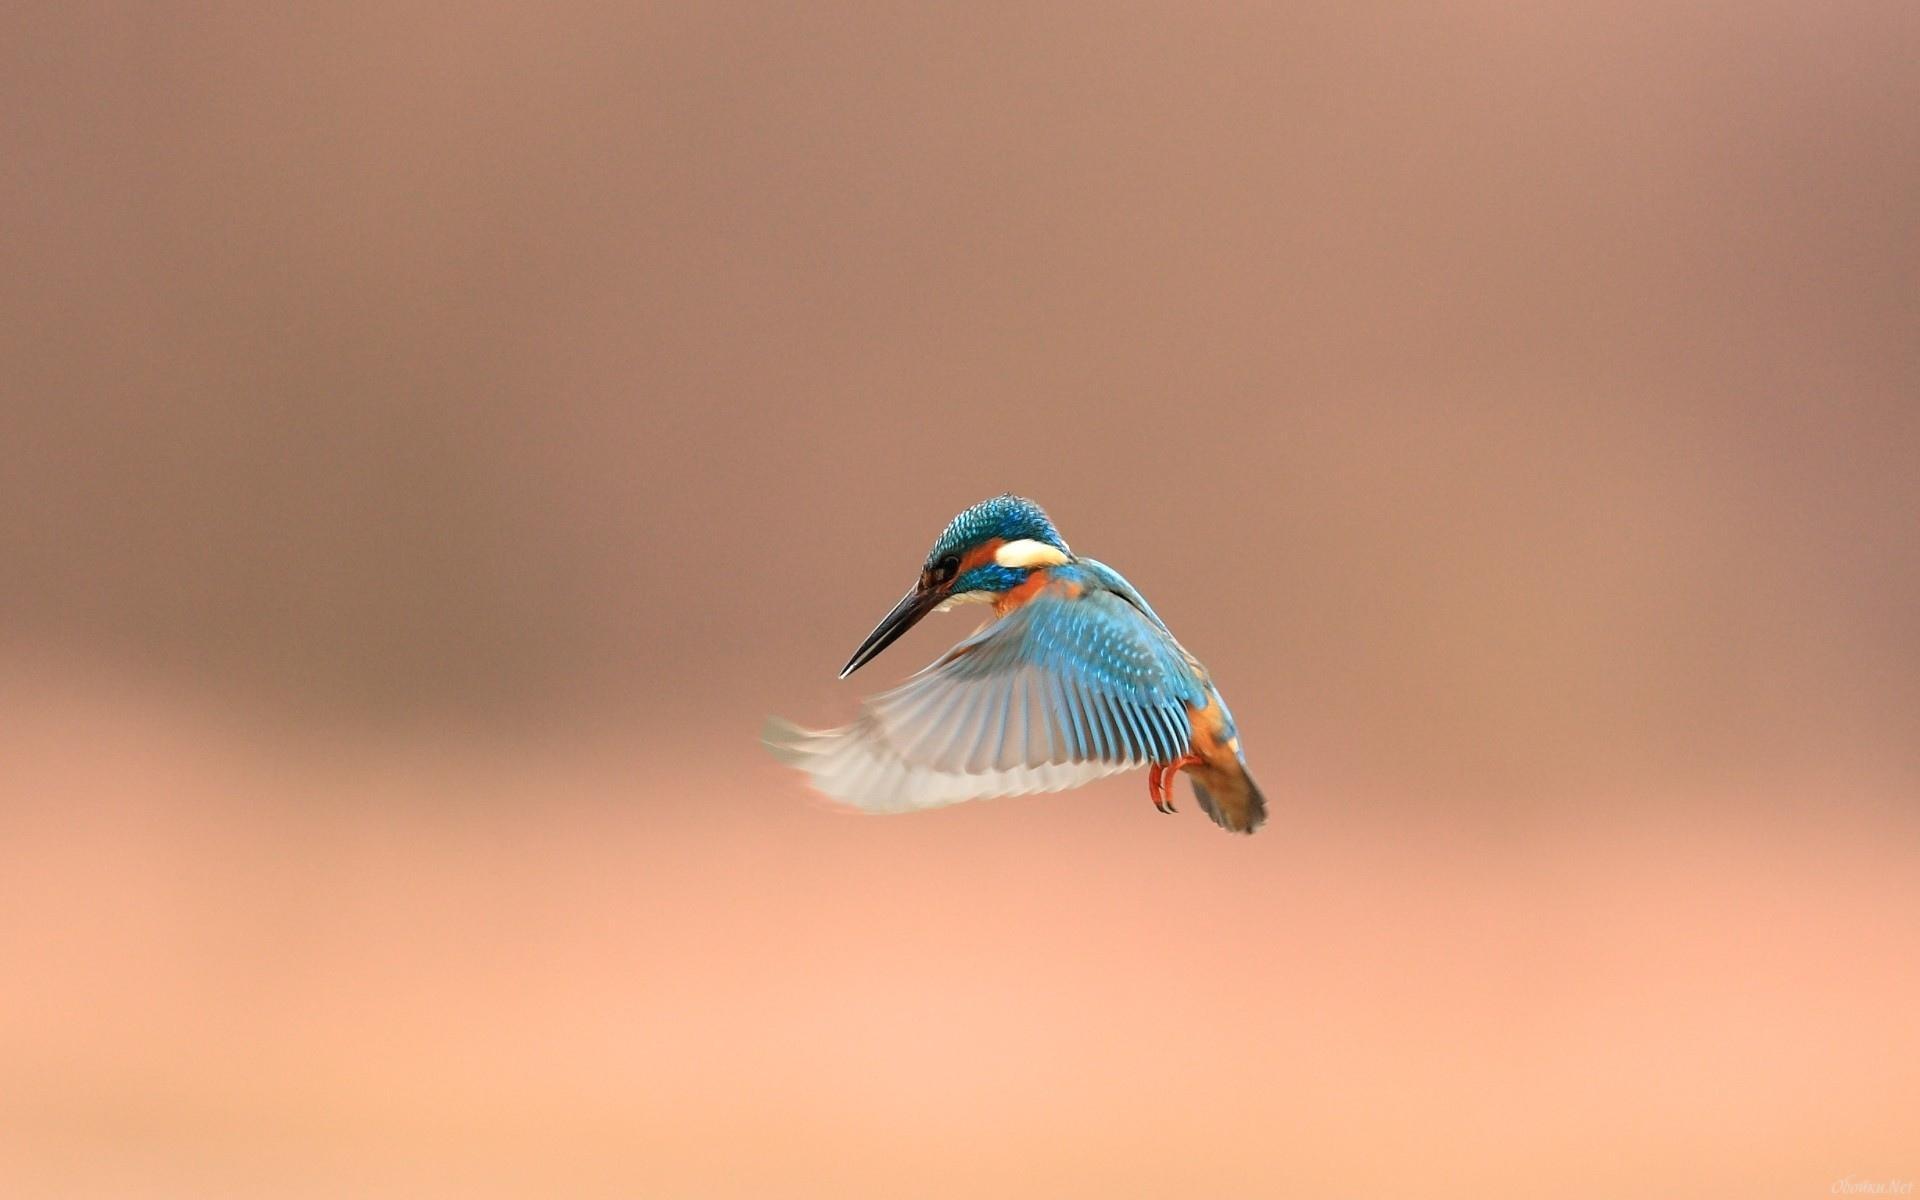 Kingfisher Calendar Wallpaper Download : Kingfisher wallpaper hd download